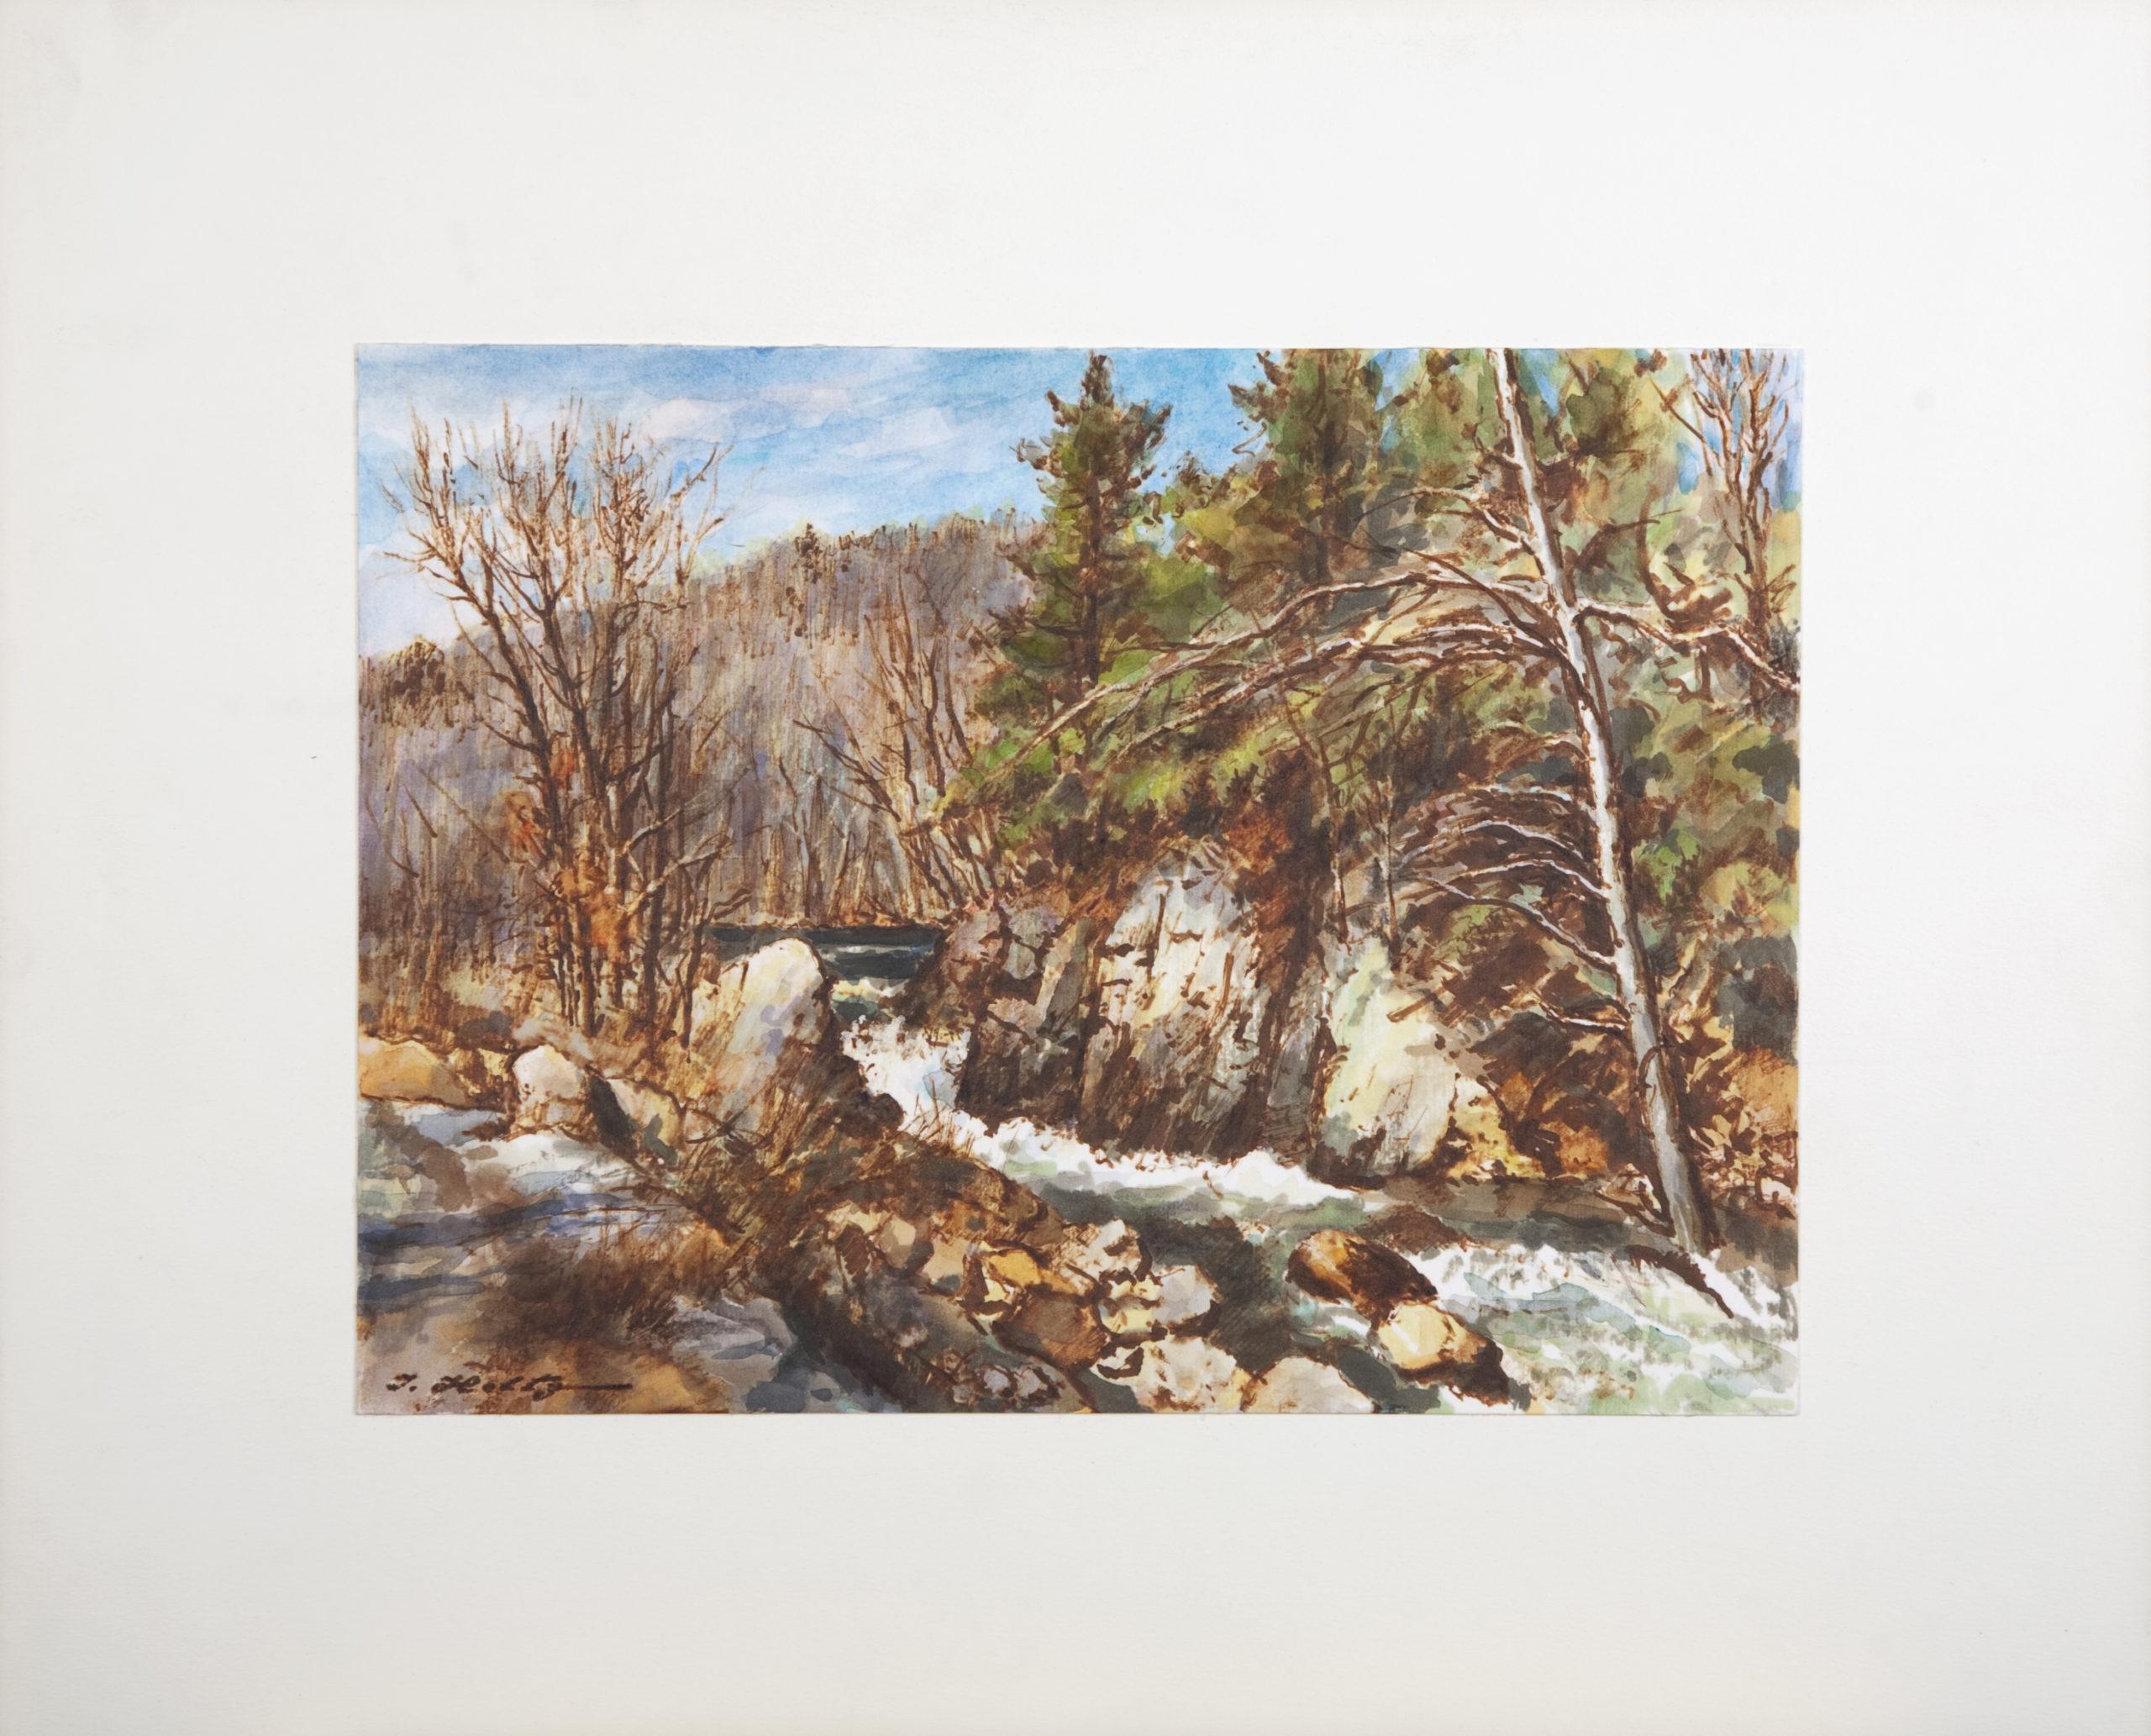 D42 River Rapids - Colored Marker - 12.125 x 9 - Matt: 18.25 x 15 - No Frame